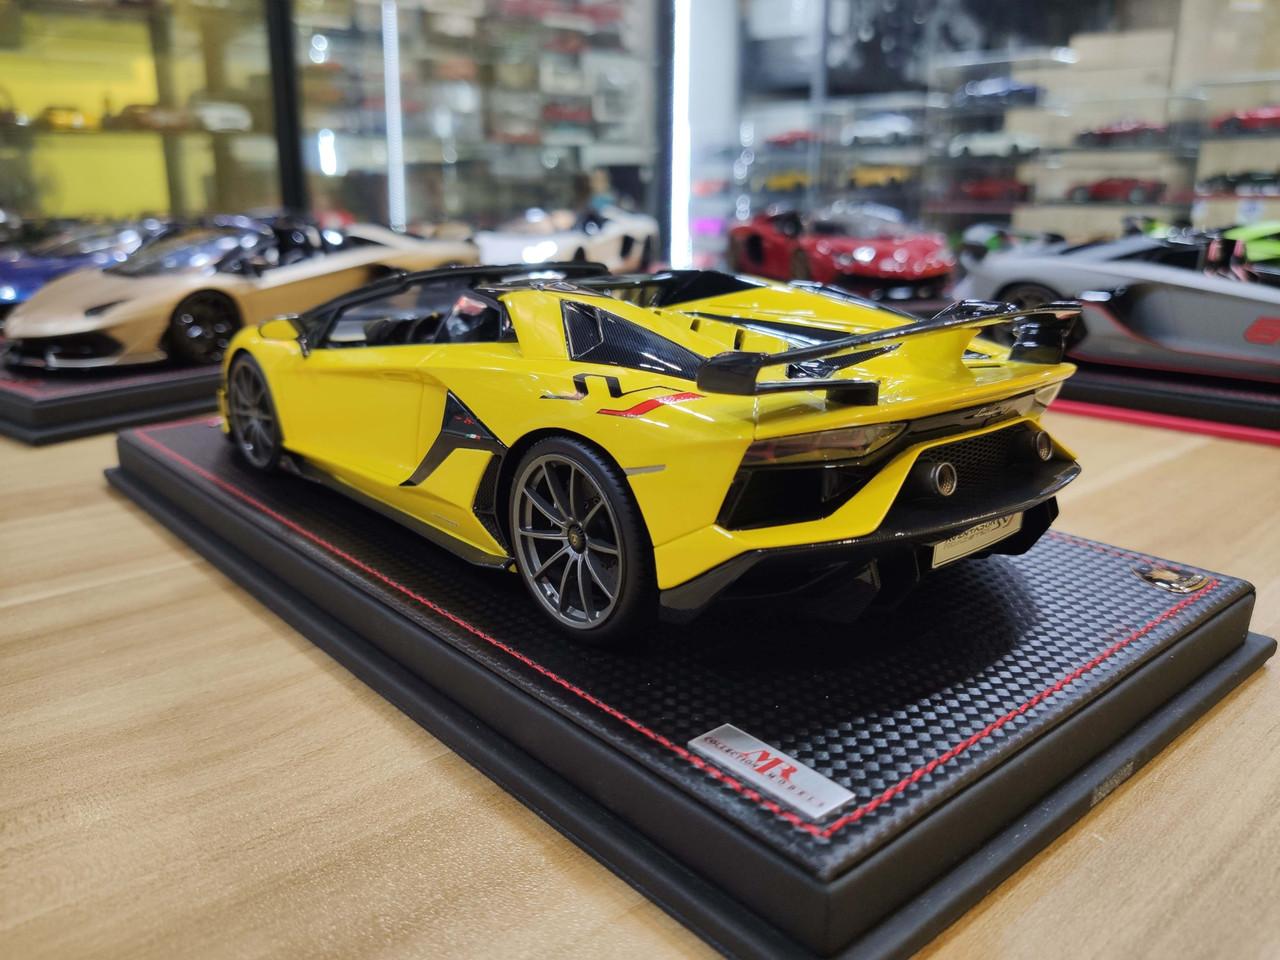 1/18 MR Lamborghini Aventador SVJ Roadster (Yellow) Resin Car Model Limited 49 Pieces